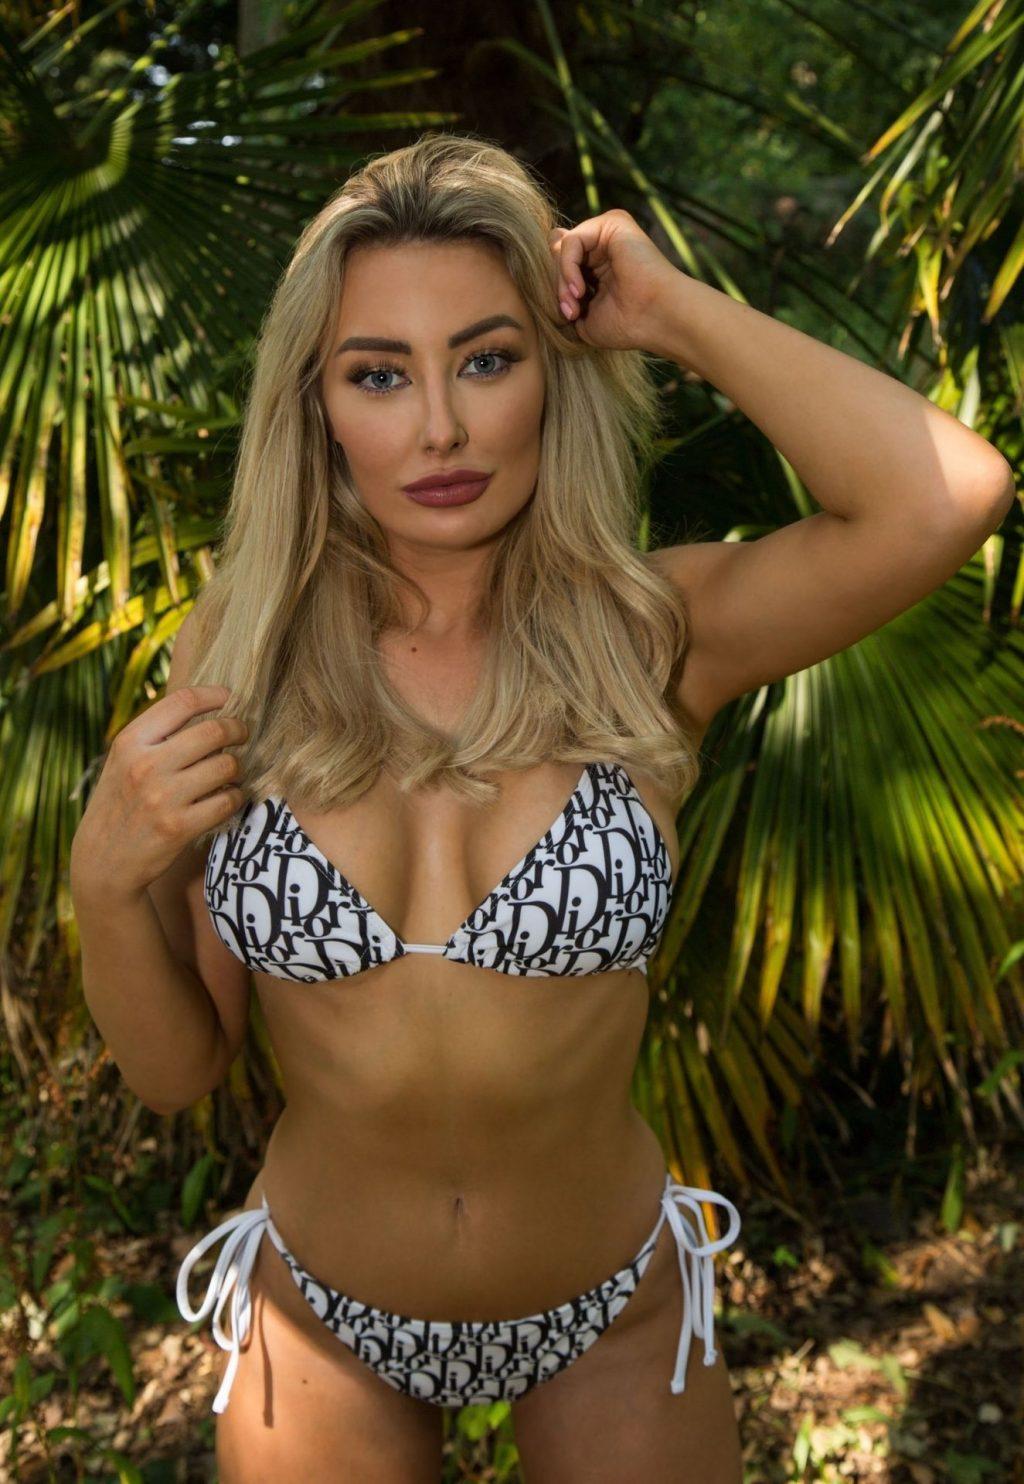 Sexy Chloe Crowhurst Stuns on a Bikini Photoshoot (6 Photos)